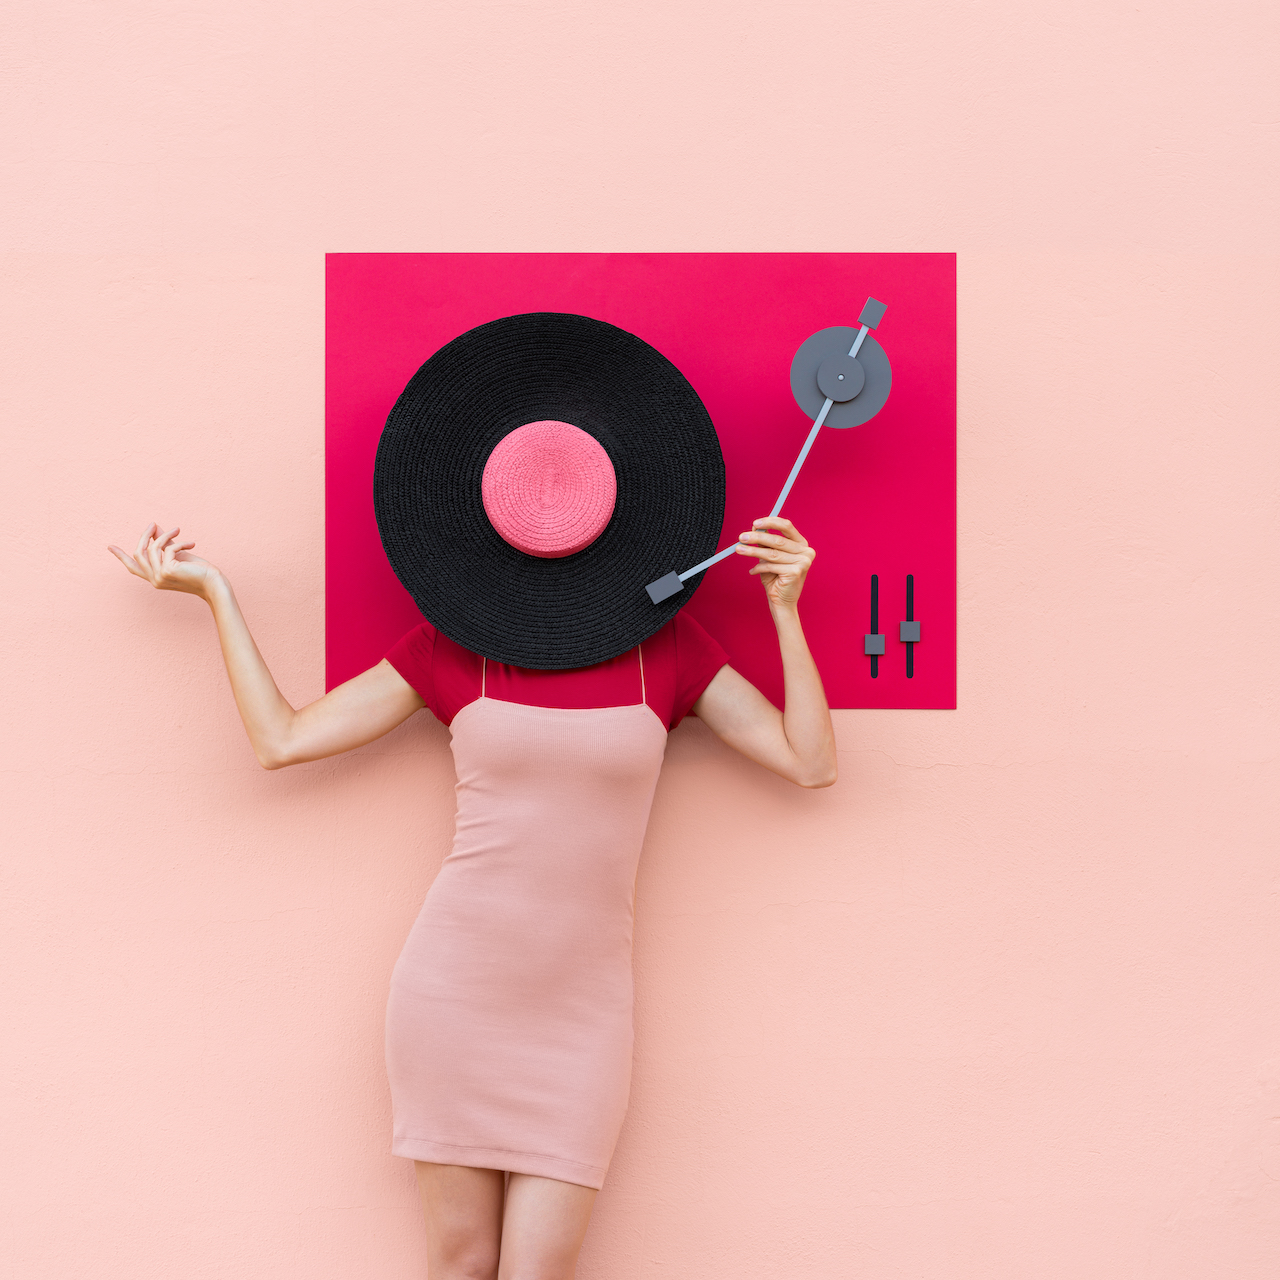 Annandaniel Anna Devís Daniel Rueda Anniset DrCuerda Creative campaign minimal photography idea colorful pink red record player vinyl vintage music hat sombrero